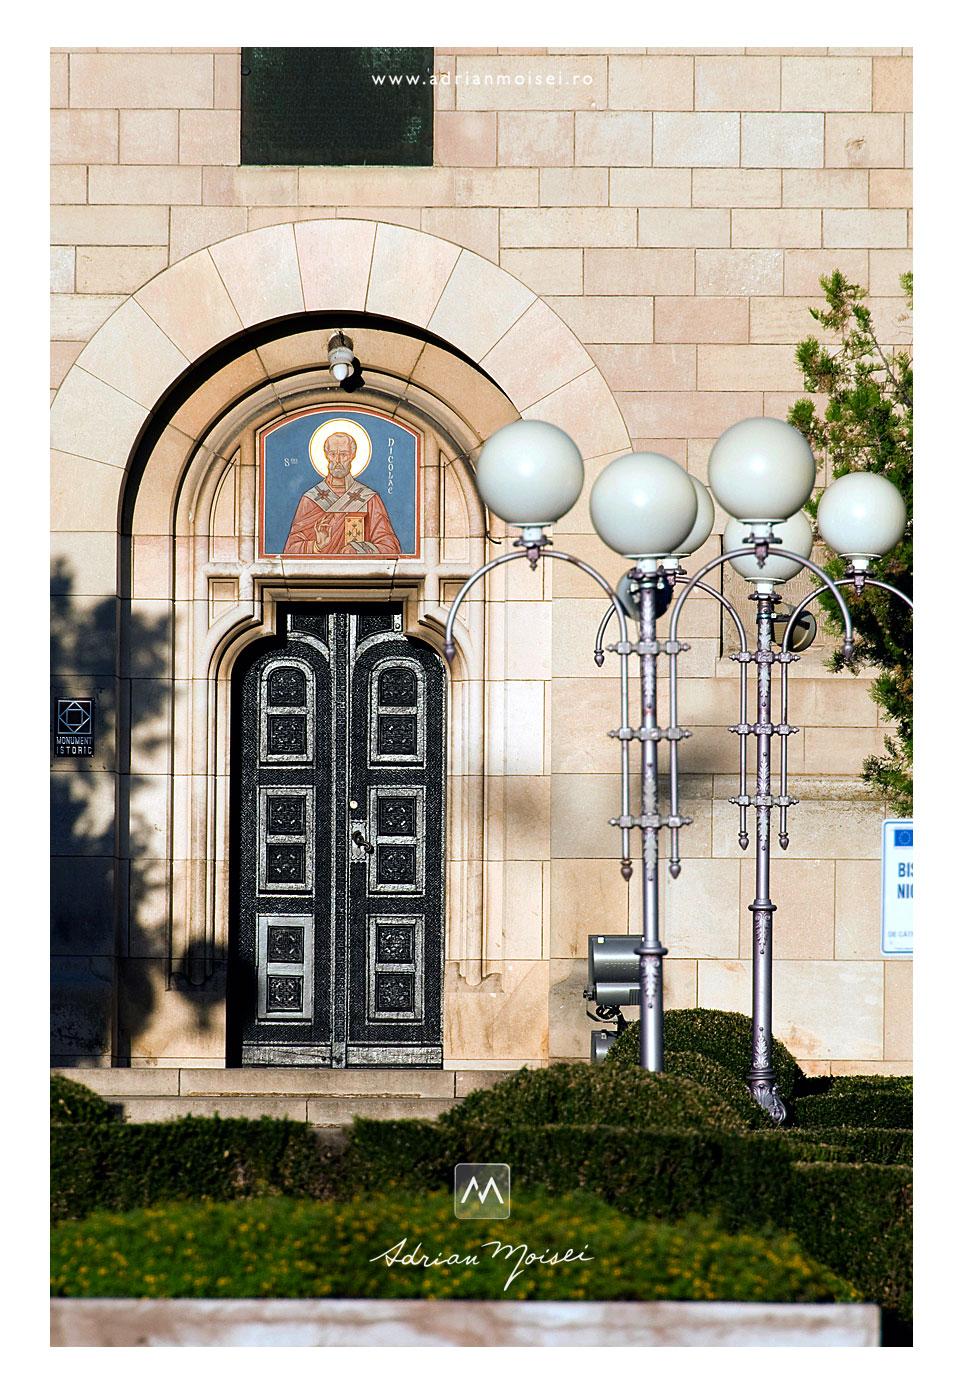 Biserica Sfântul Nicolae Domnesc Iasi usa de la intrare